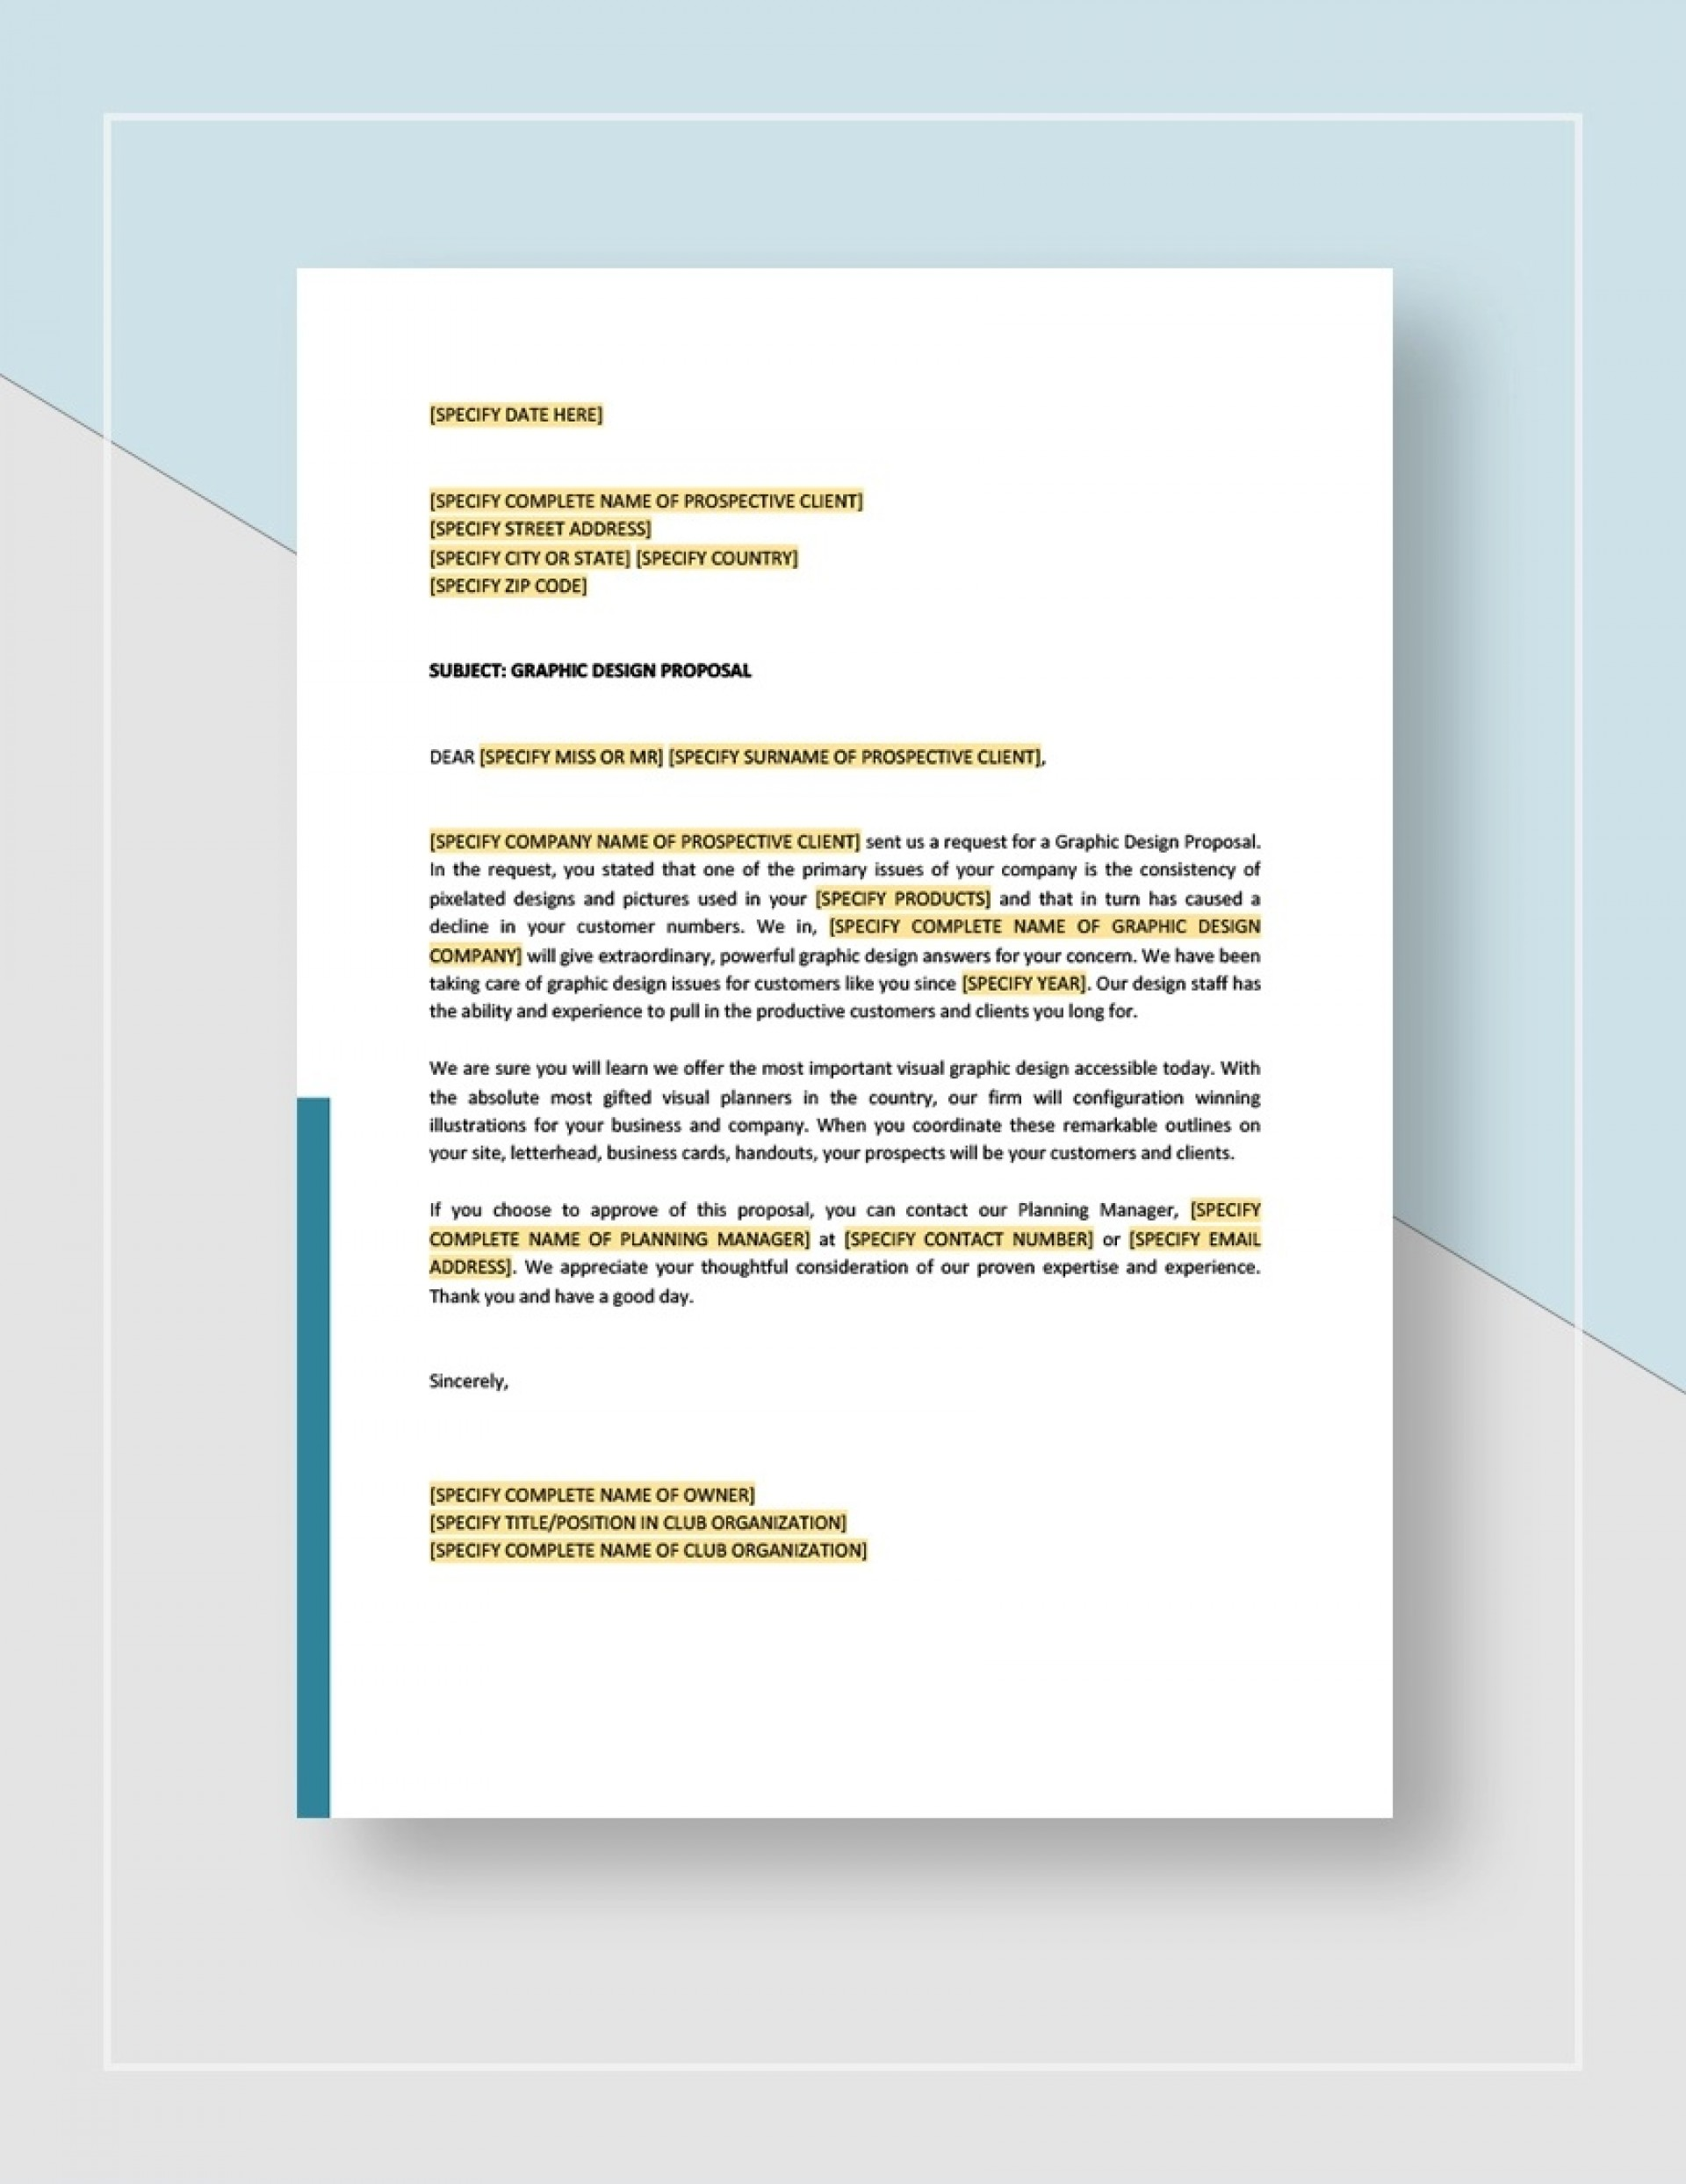 Graphic Design Proposal Template Sample Idea Jpg  Pdf Doc Word1920